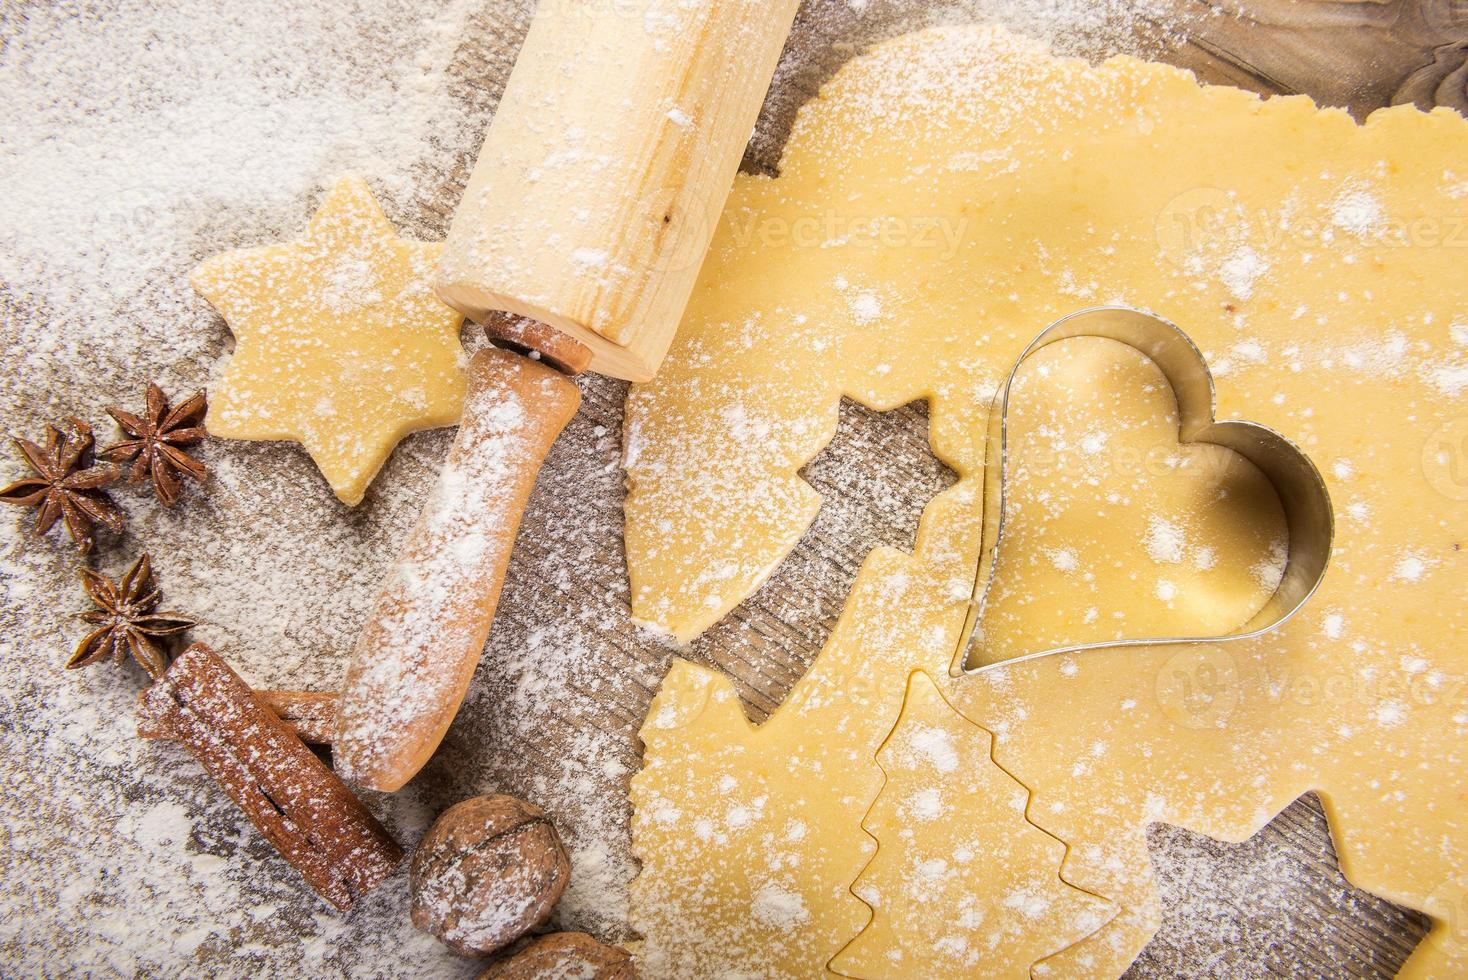 kerst bakken, koekjes, deegroller, kruiden foto